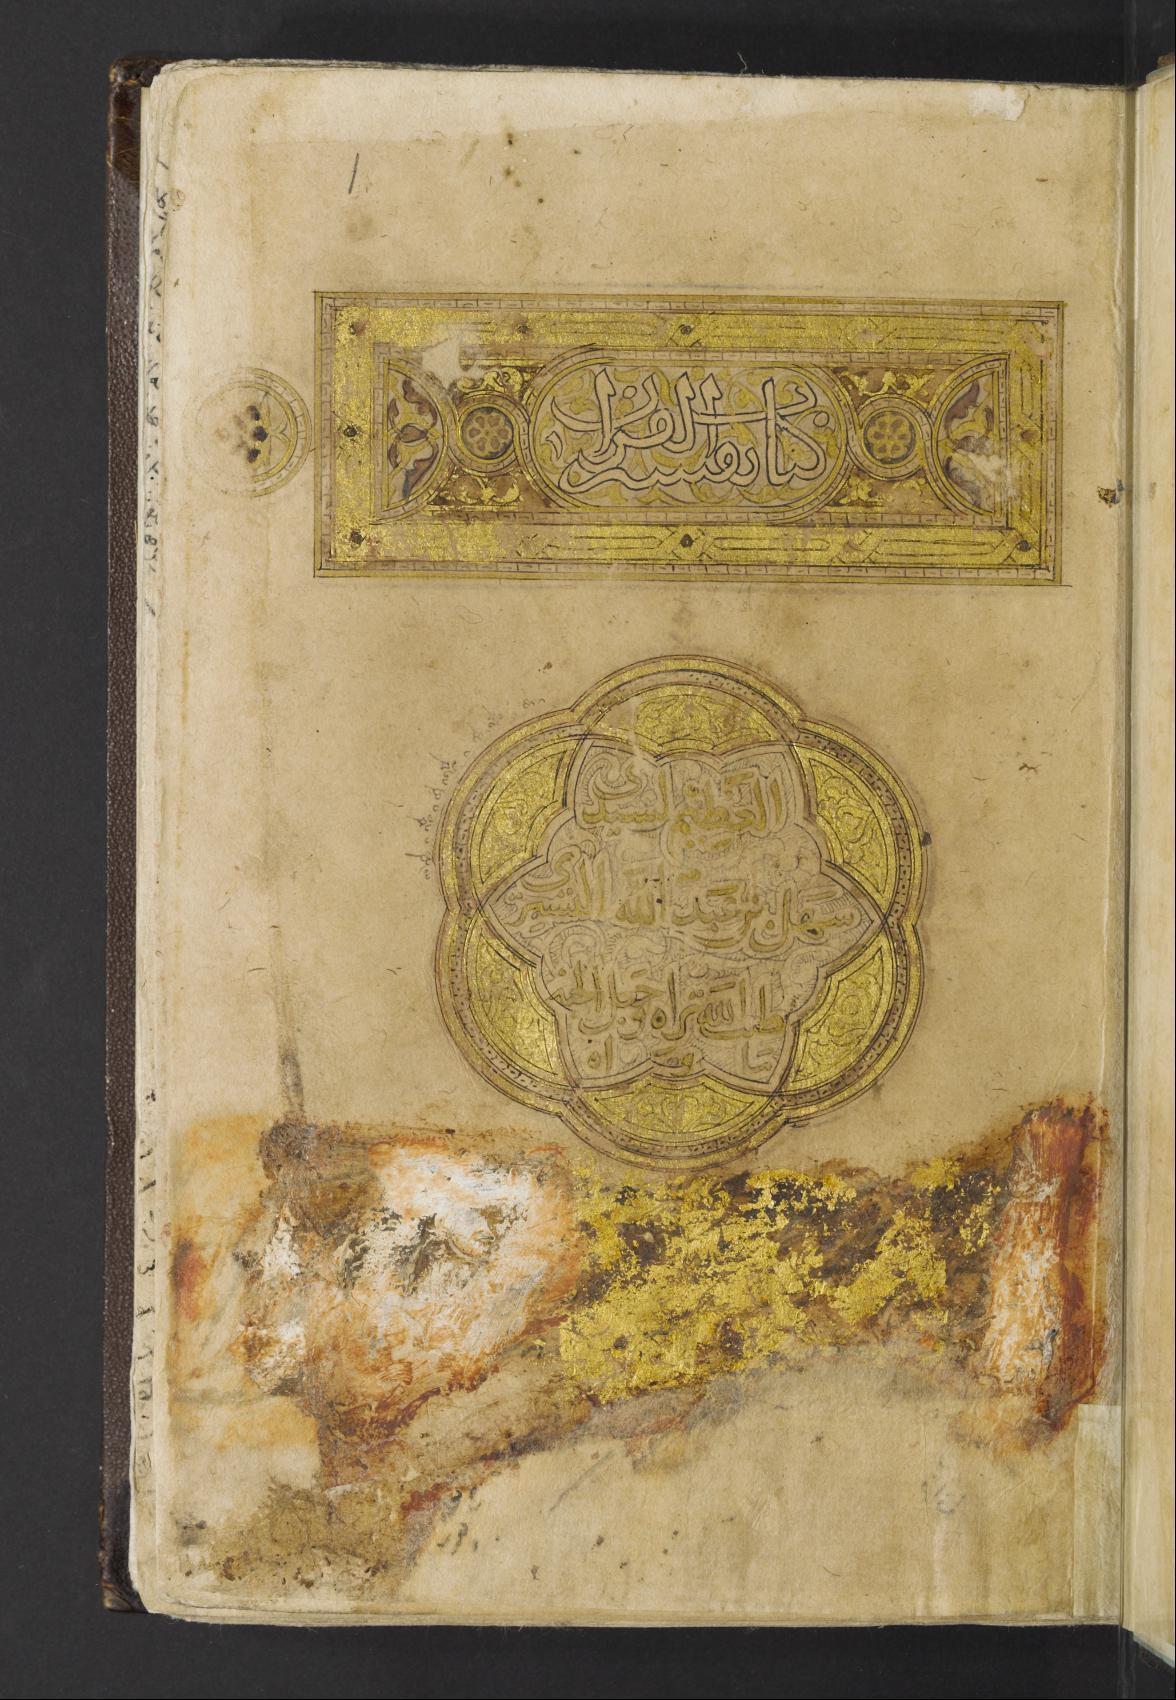 Ms. orient. A 529 - Tafsīr al-Qurʾān al-ʽaẓīm